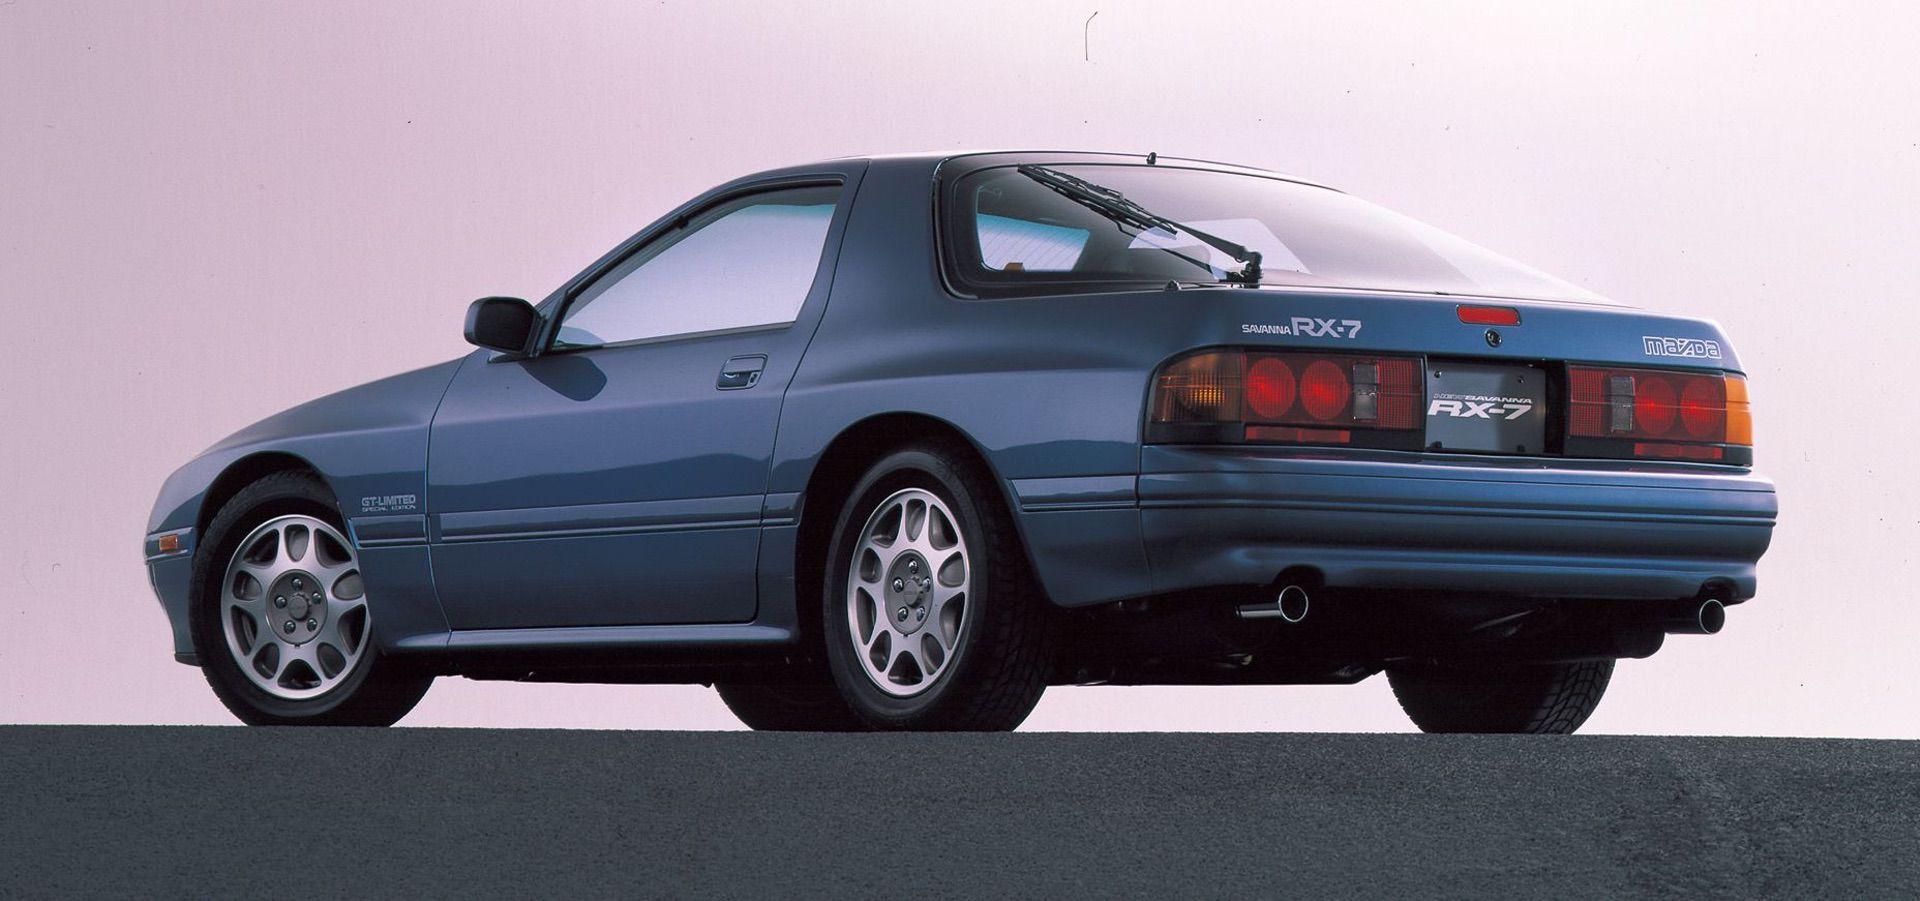 Mazda_RX-7_history_0080